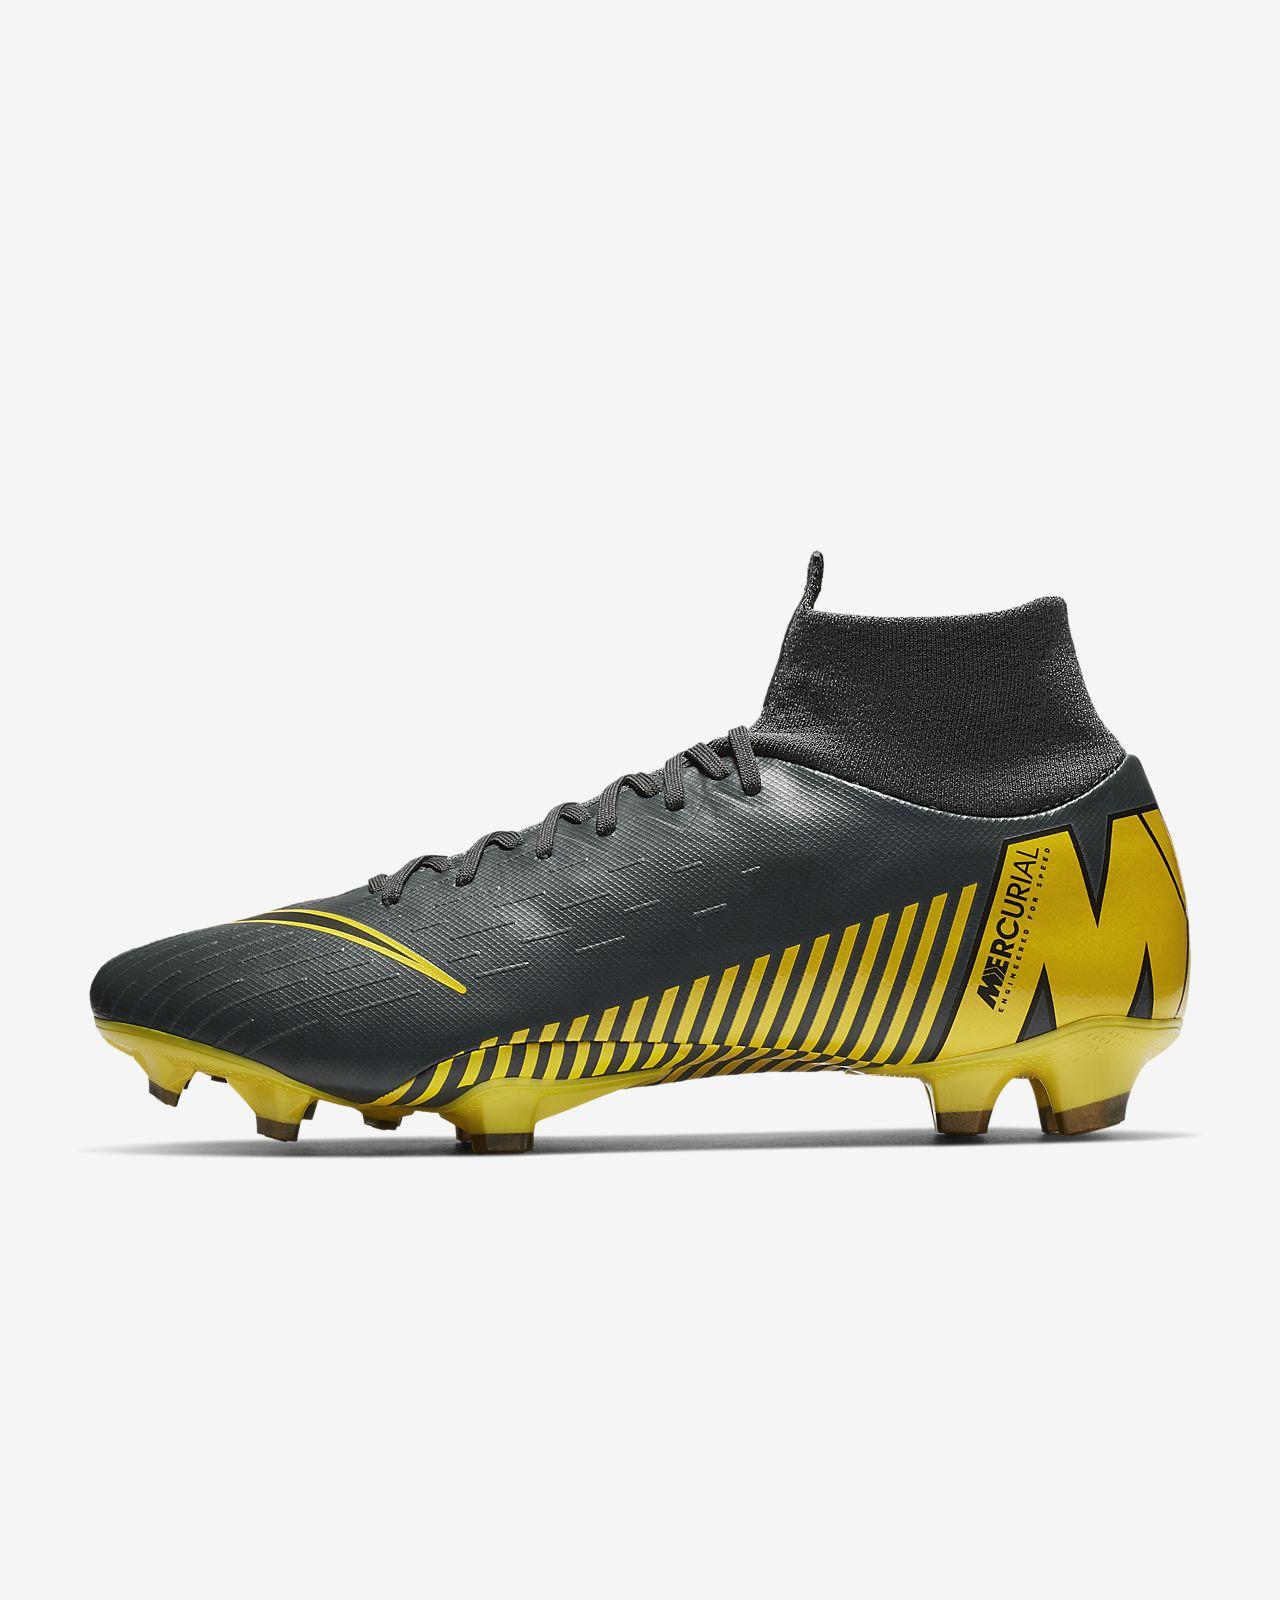 1e286fda0c5875 Nike Superfly 6 Pro FG Firm-Ground Football Boot. Nike.com GB